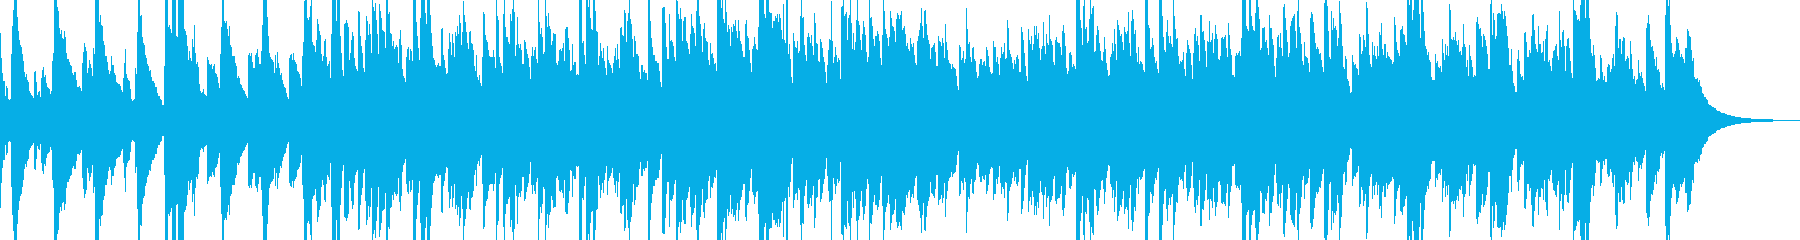 RPG風オルゴールの再生済みの波形